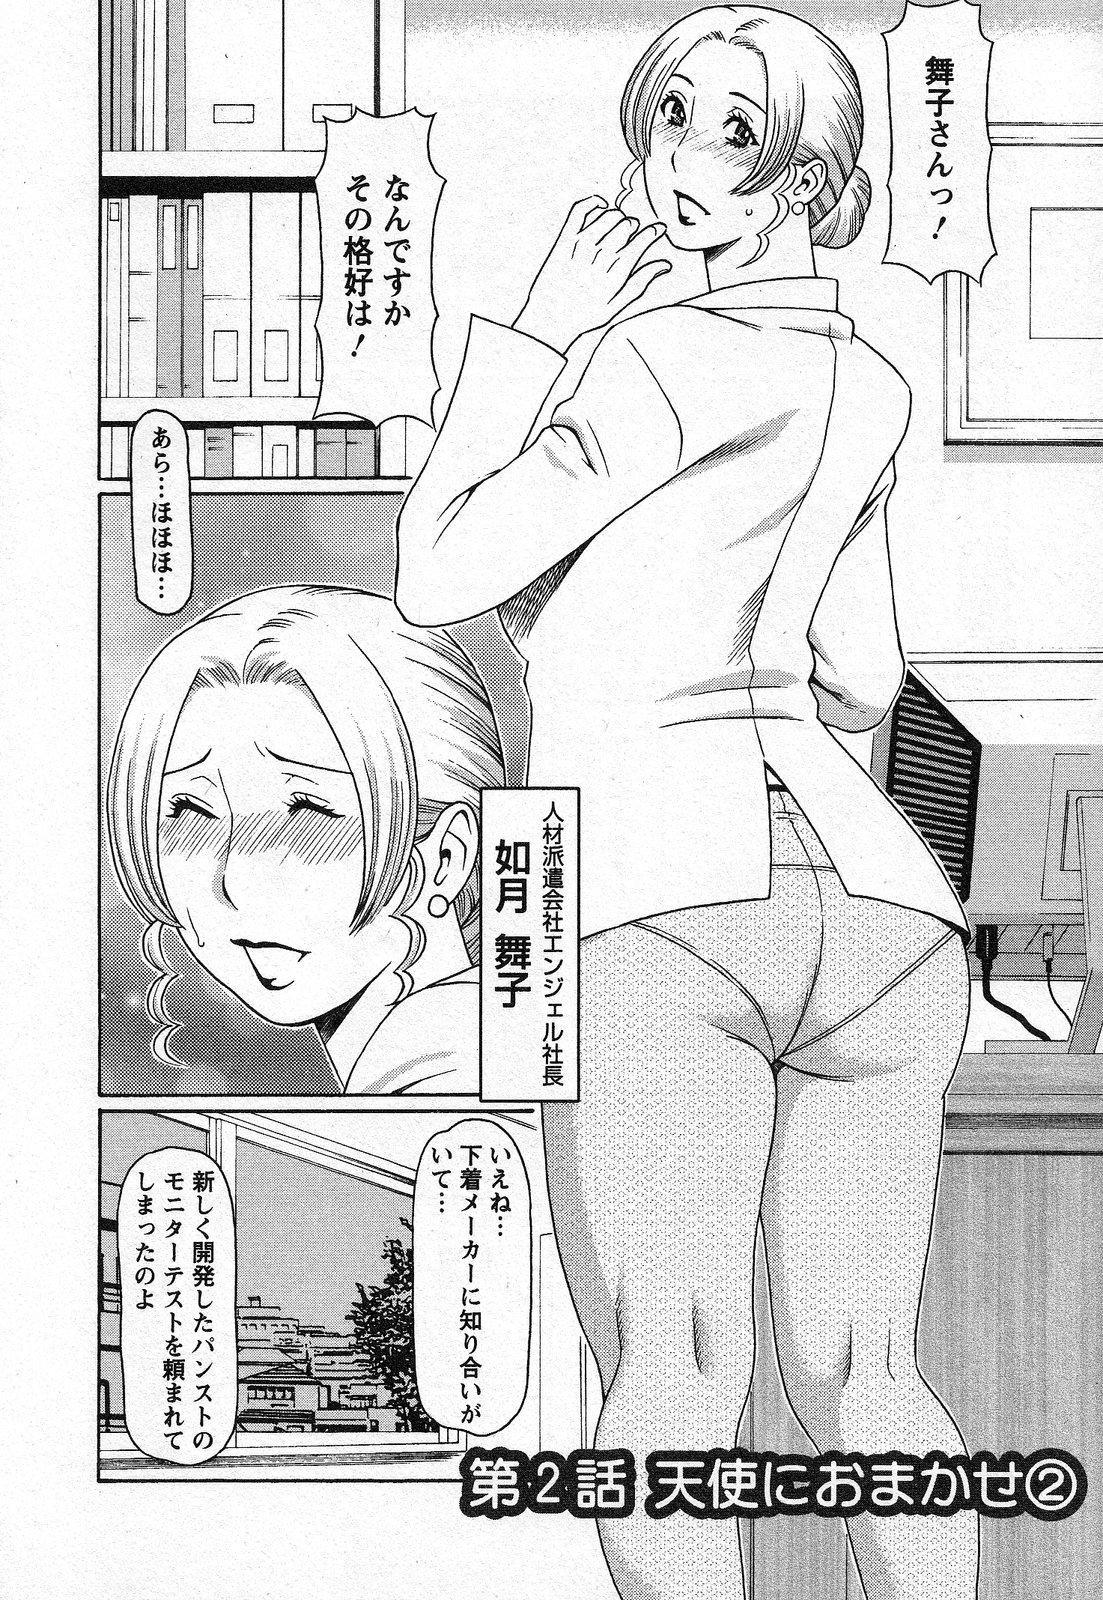 Tenshi ni Omakase 24